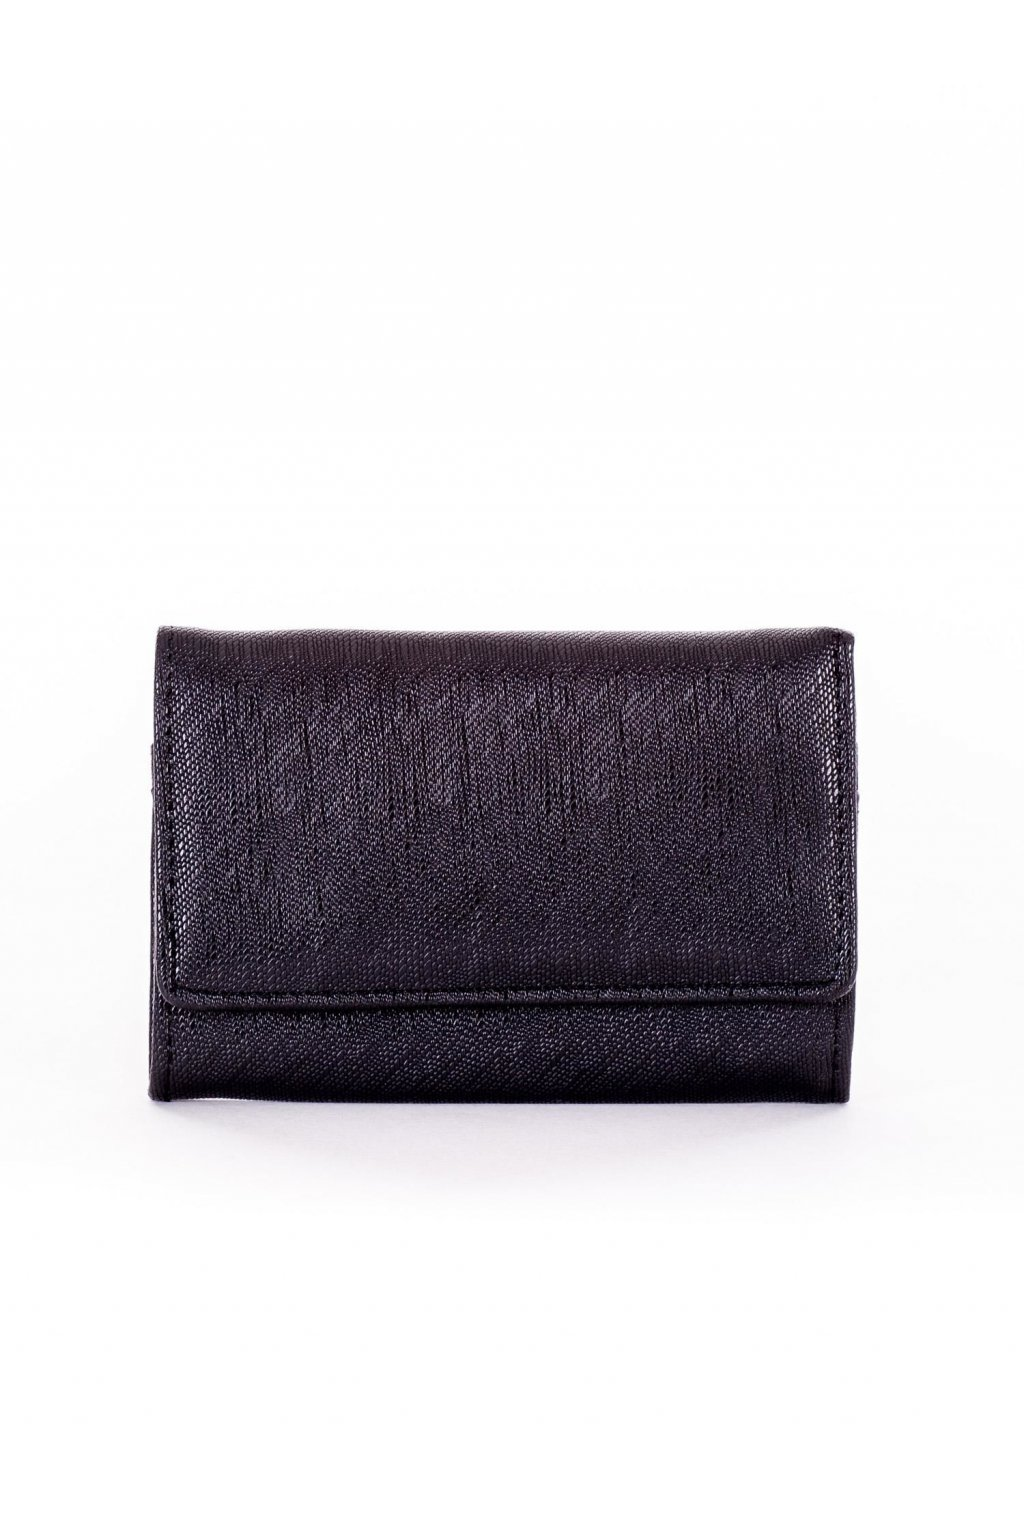 Peňaženka kód G116-1627